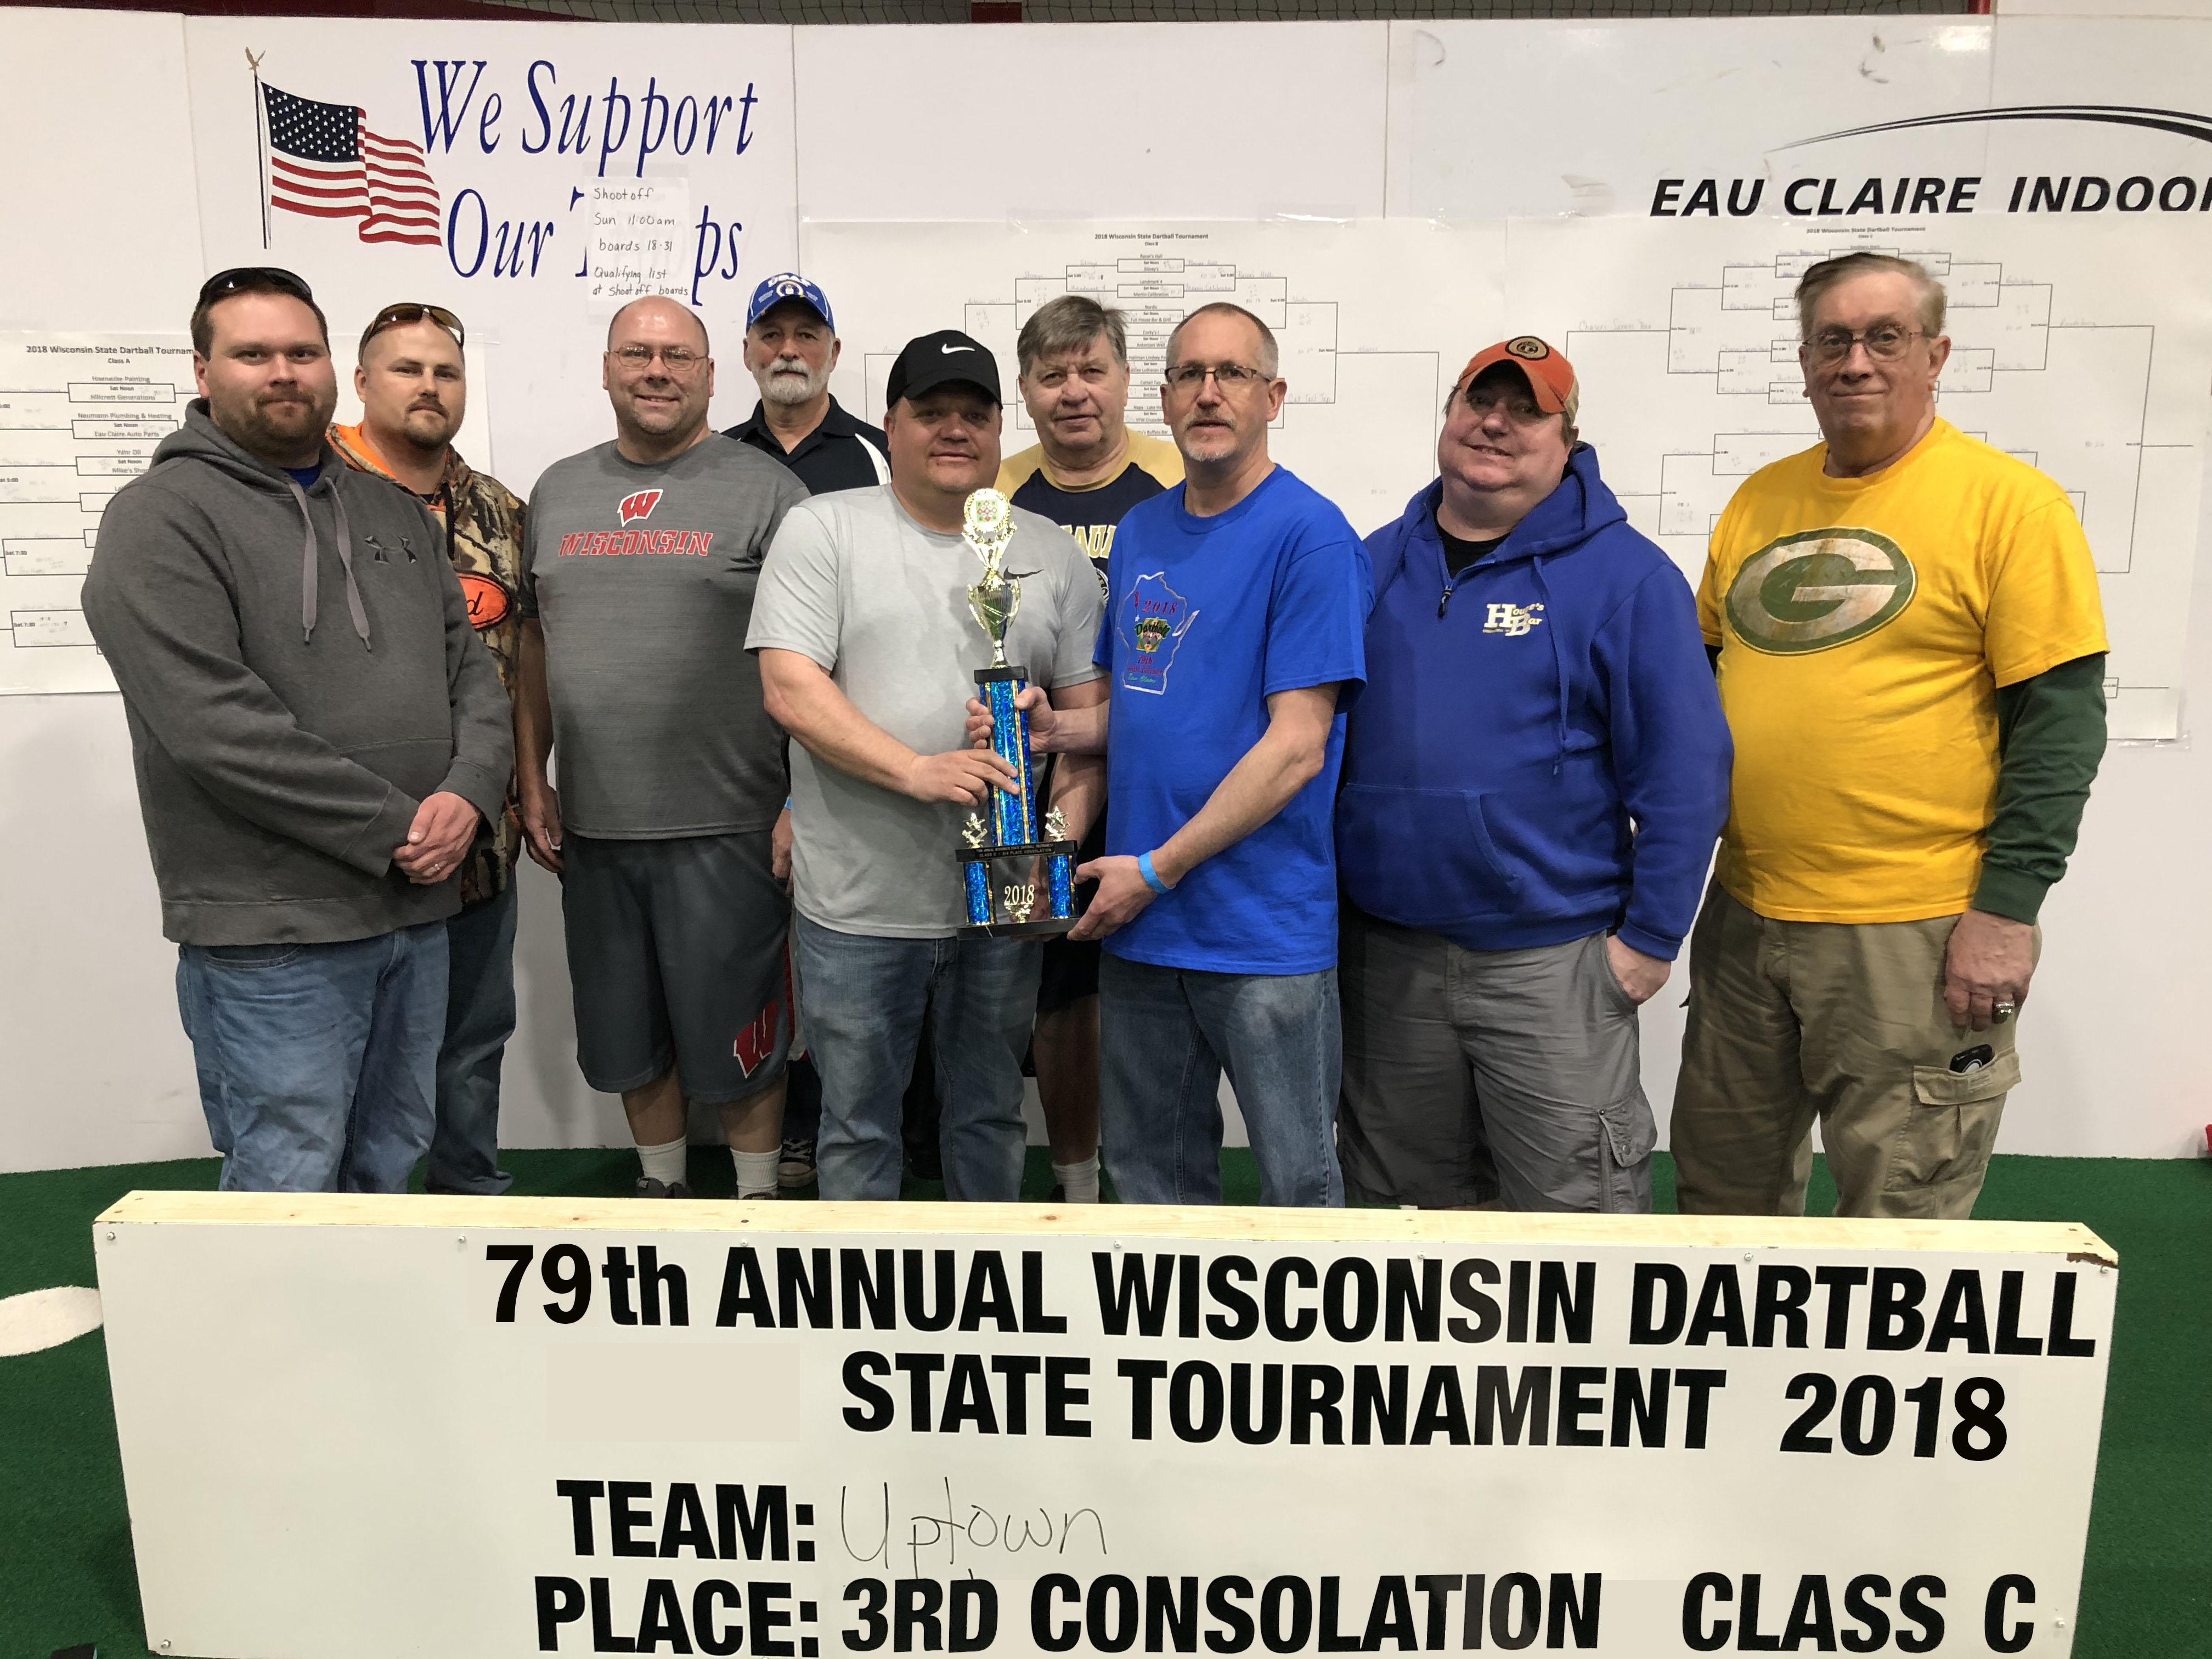 Wisconsin dartball